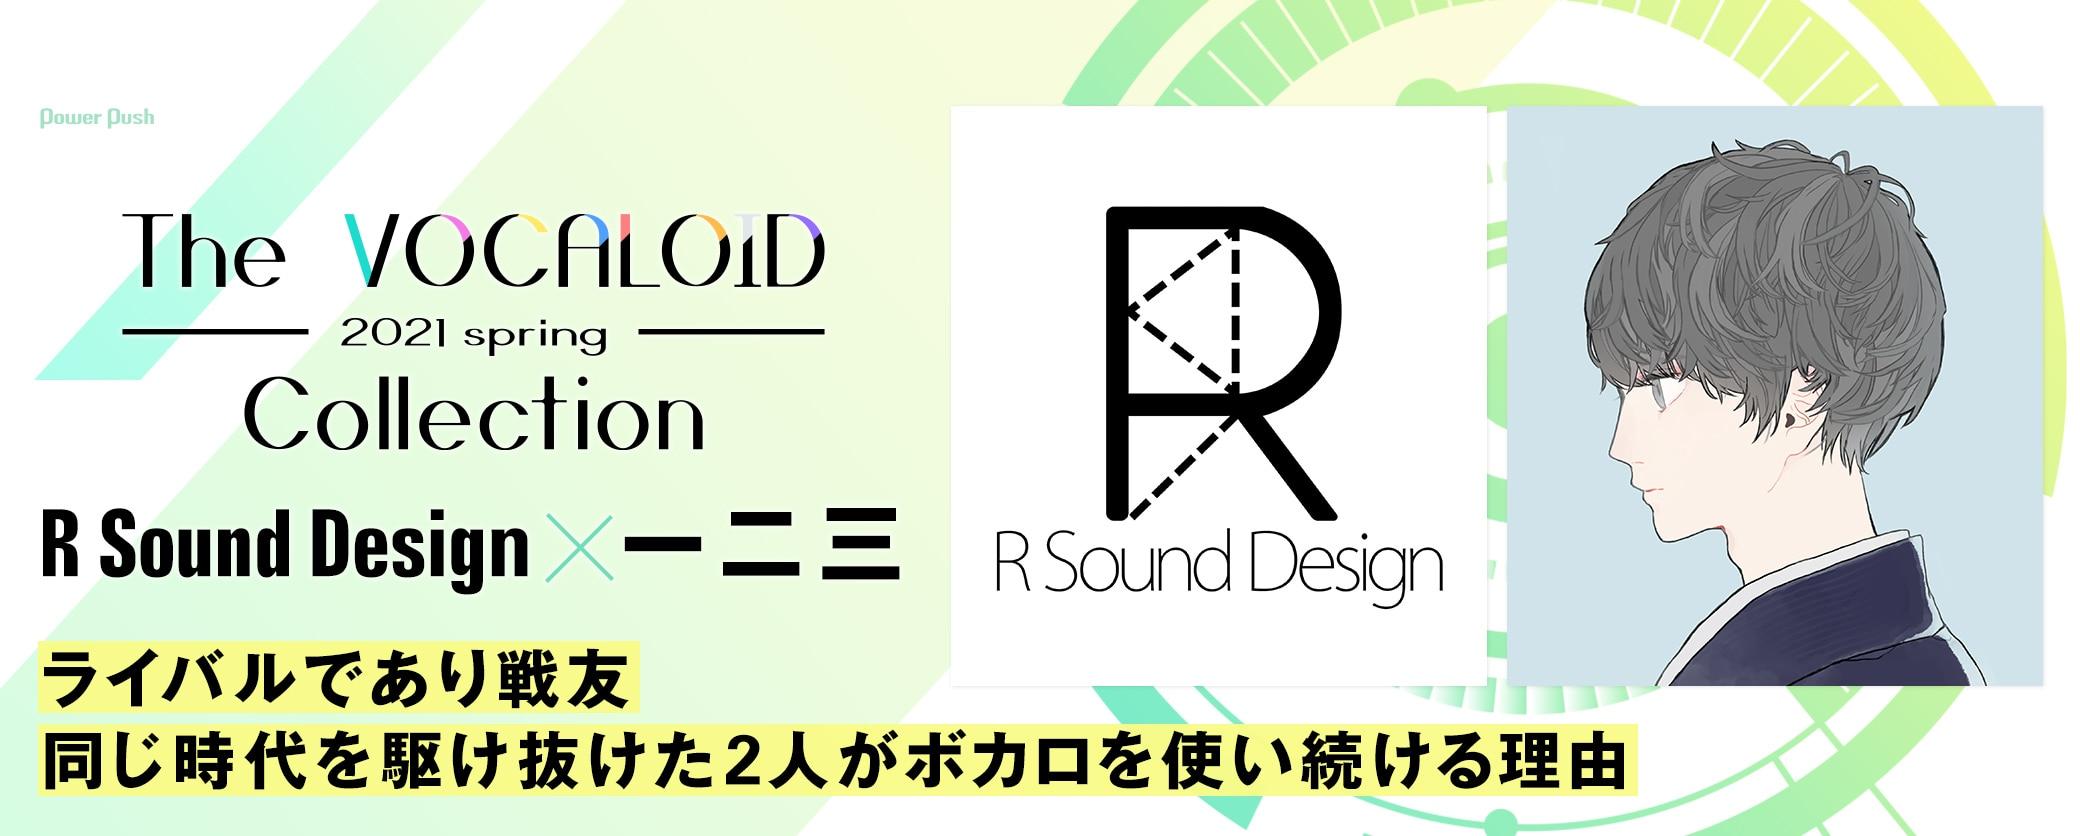 The VOCALOID Collection ~2021 Spring~ | R Sound Design×一二三 ライバルであり戦友、同じ時代を駆け抜けた2人がボカロを使い続ける理由